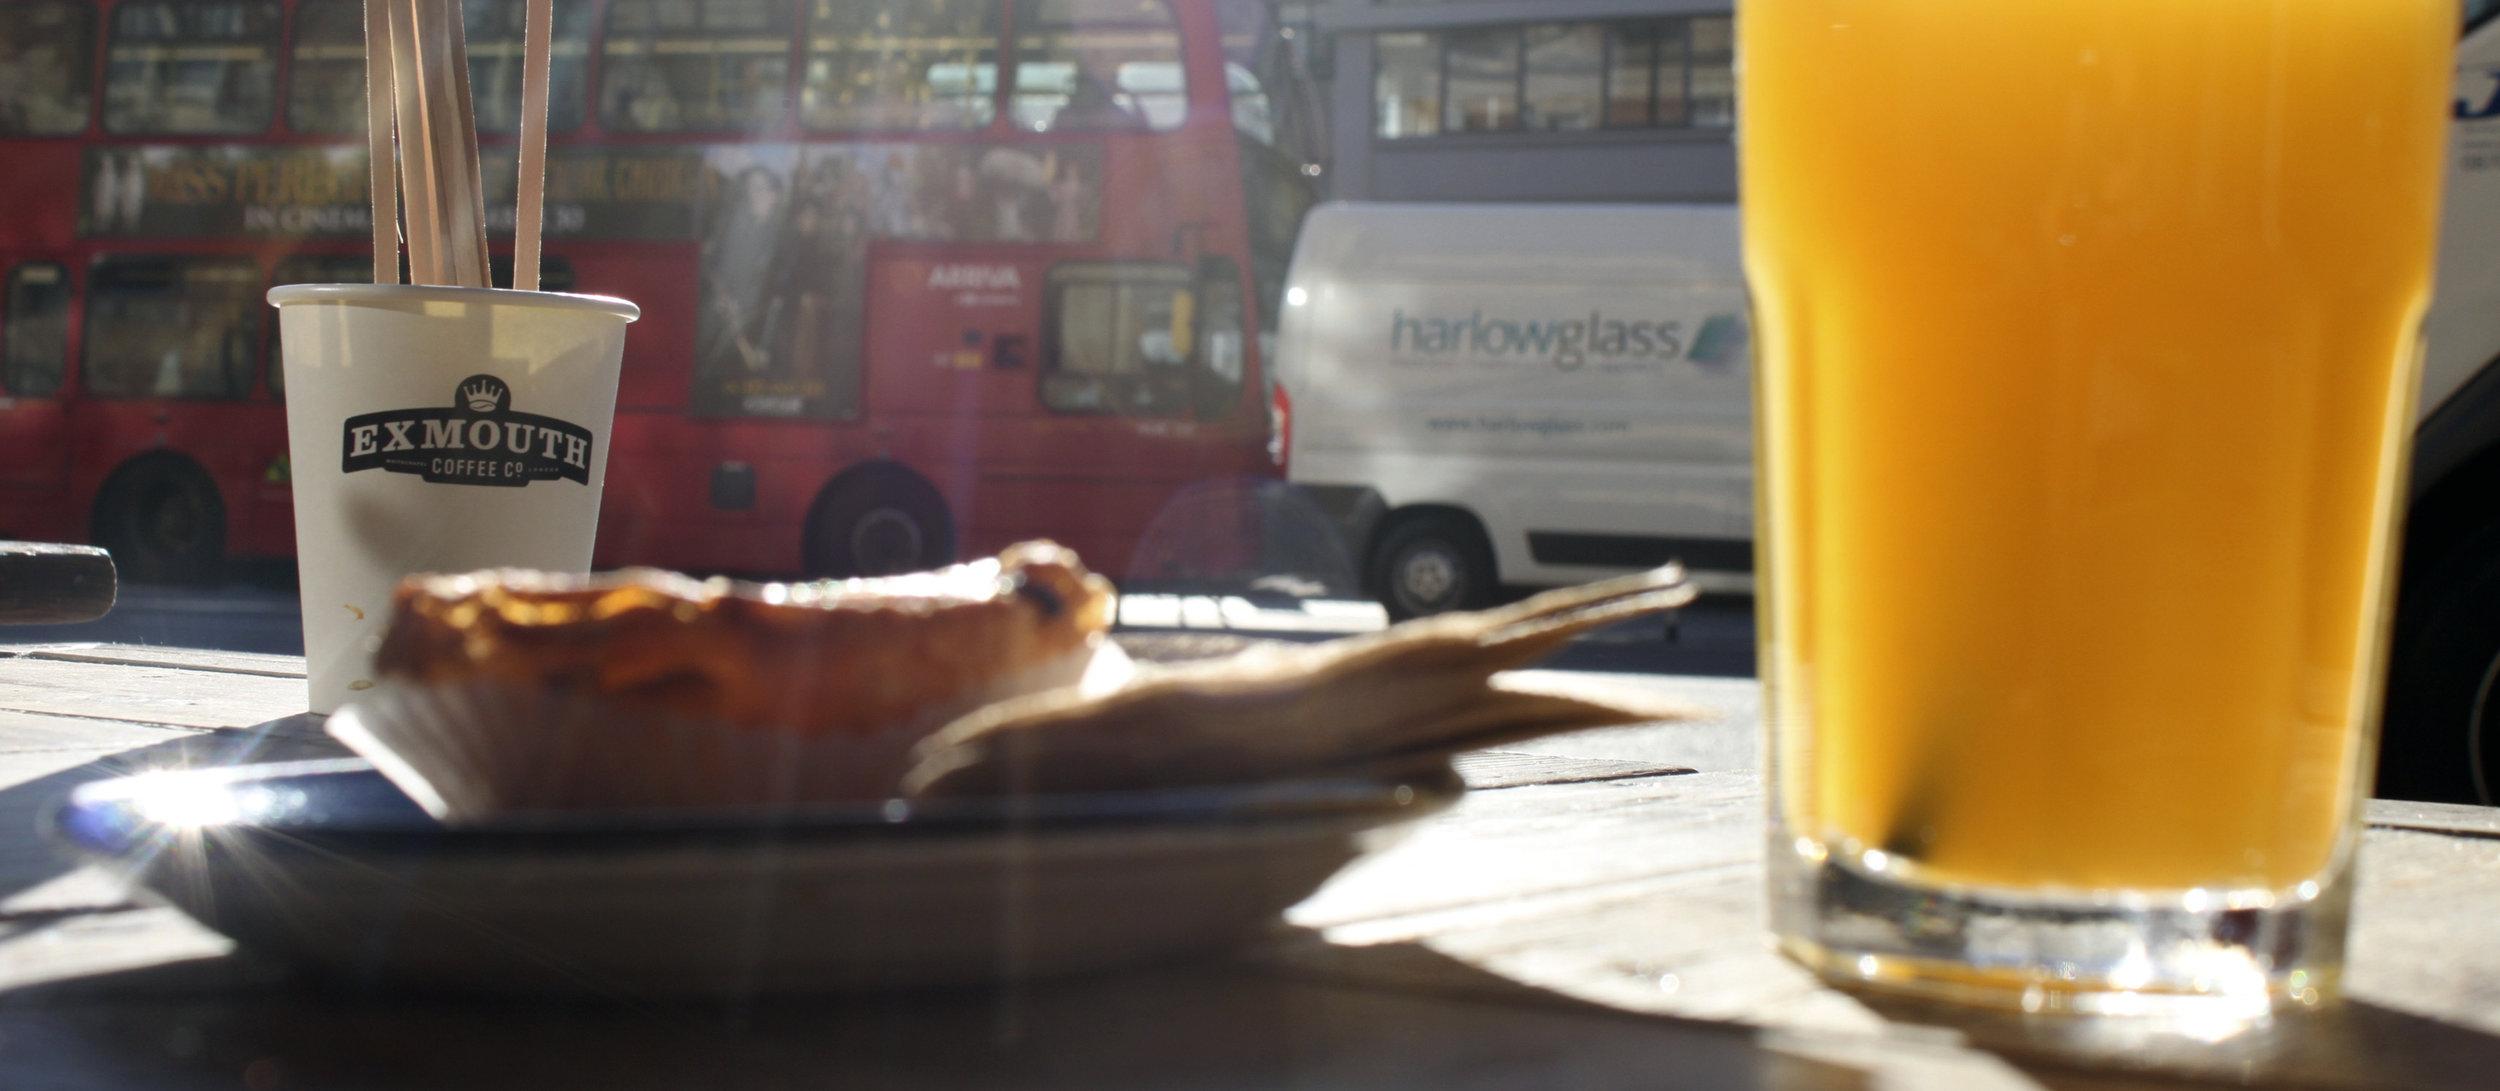 London Breakfast tent london design festival